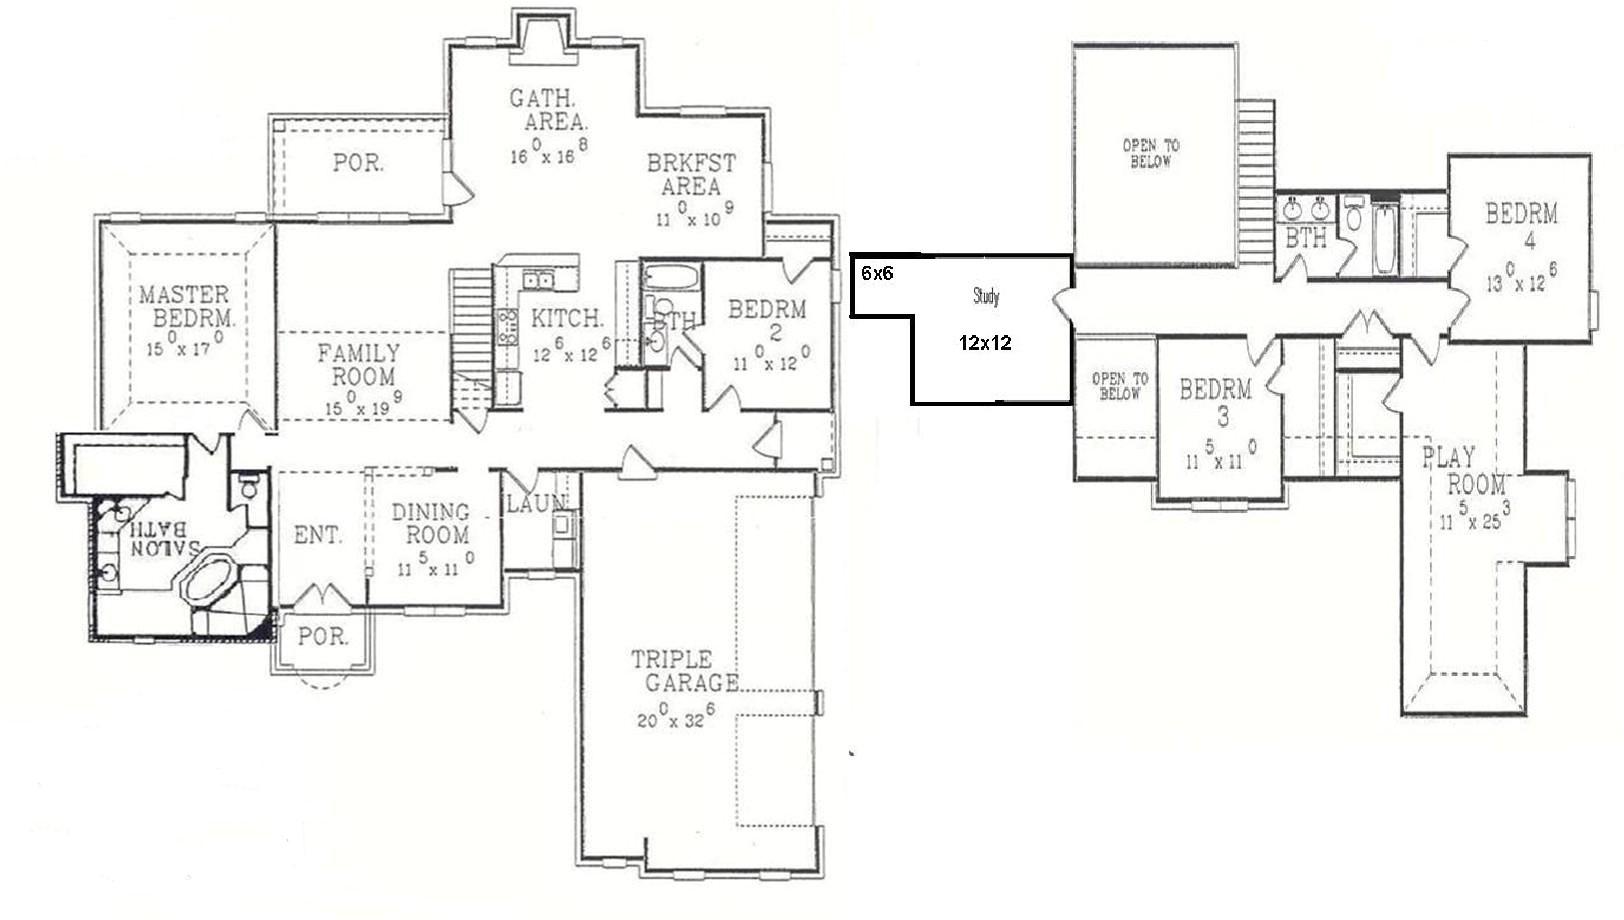 2000 oakwood mobile home floor plan